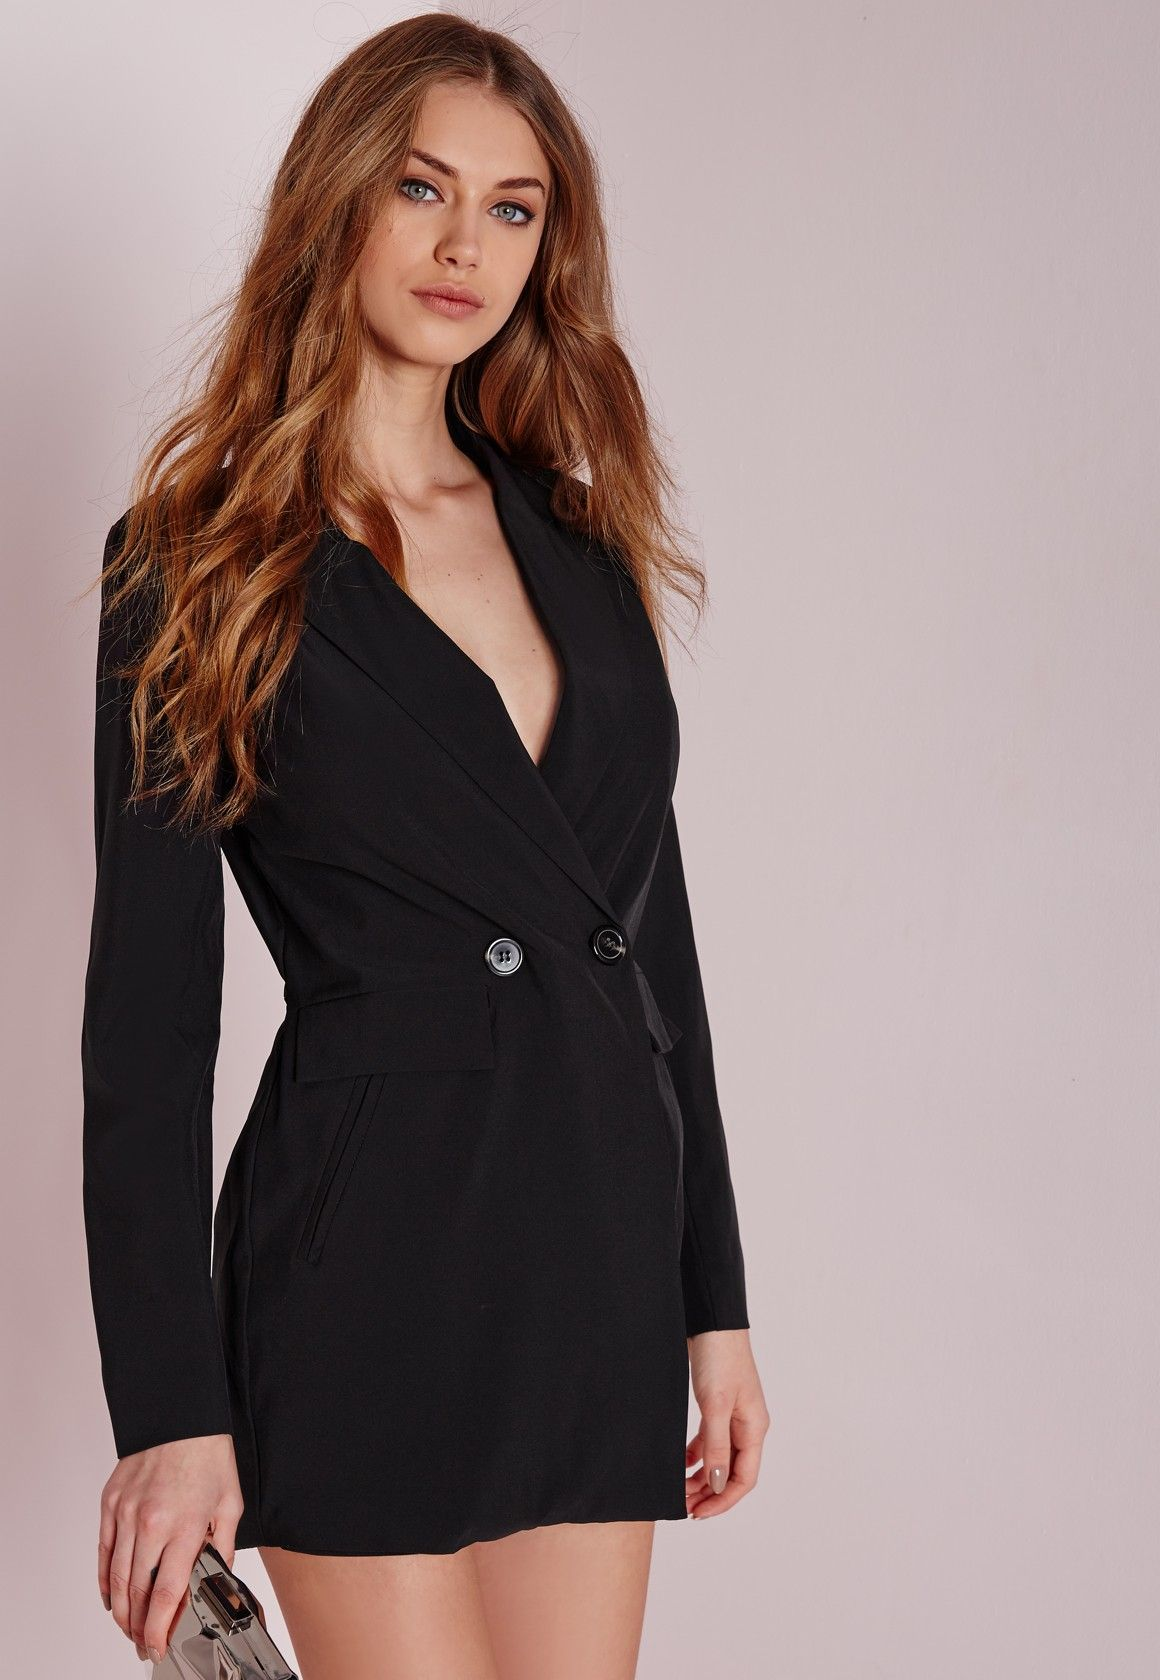 5b2c4199947 Missguided - Tuxedo Style Long Sleeve Playsuit Black